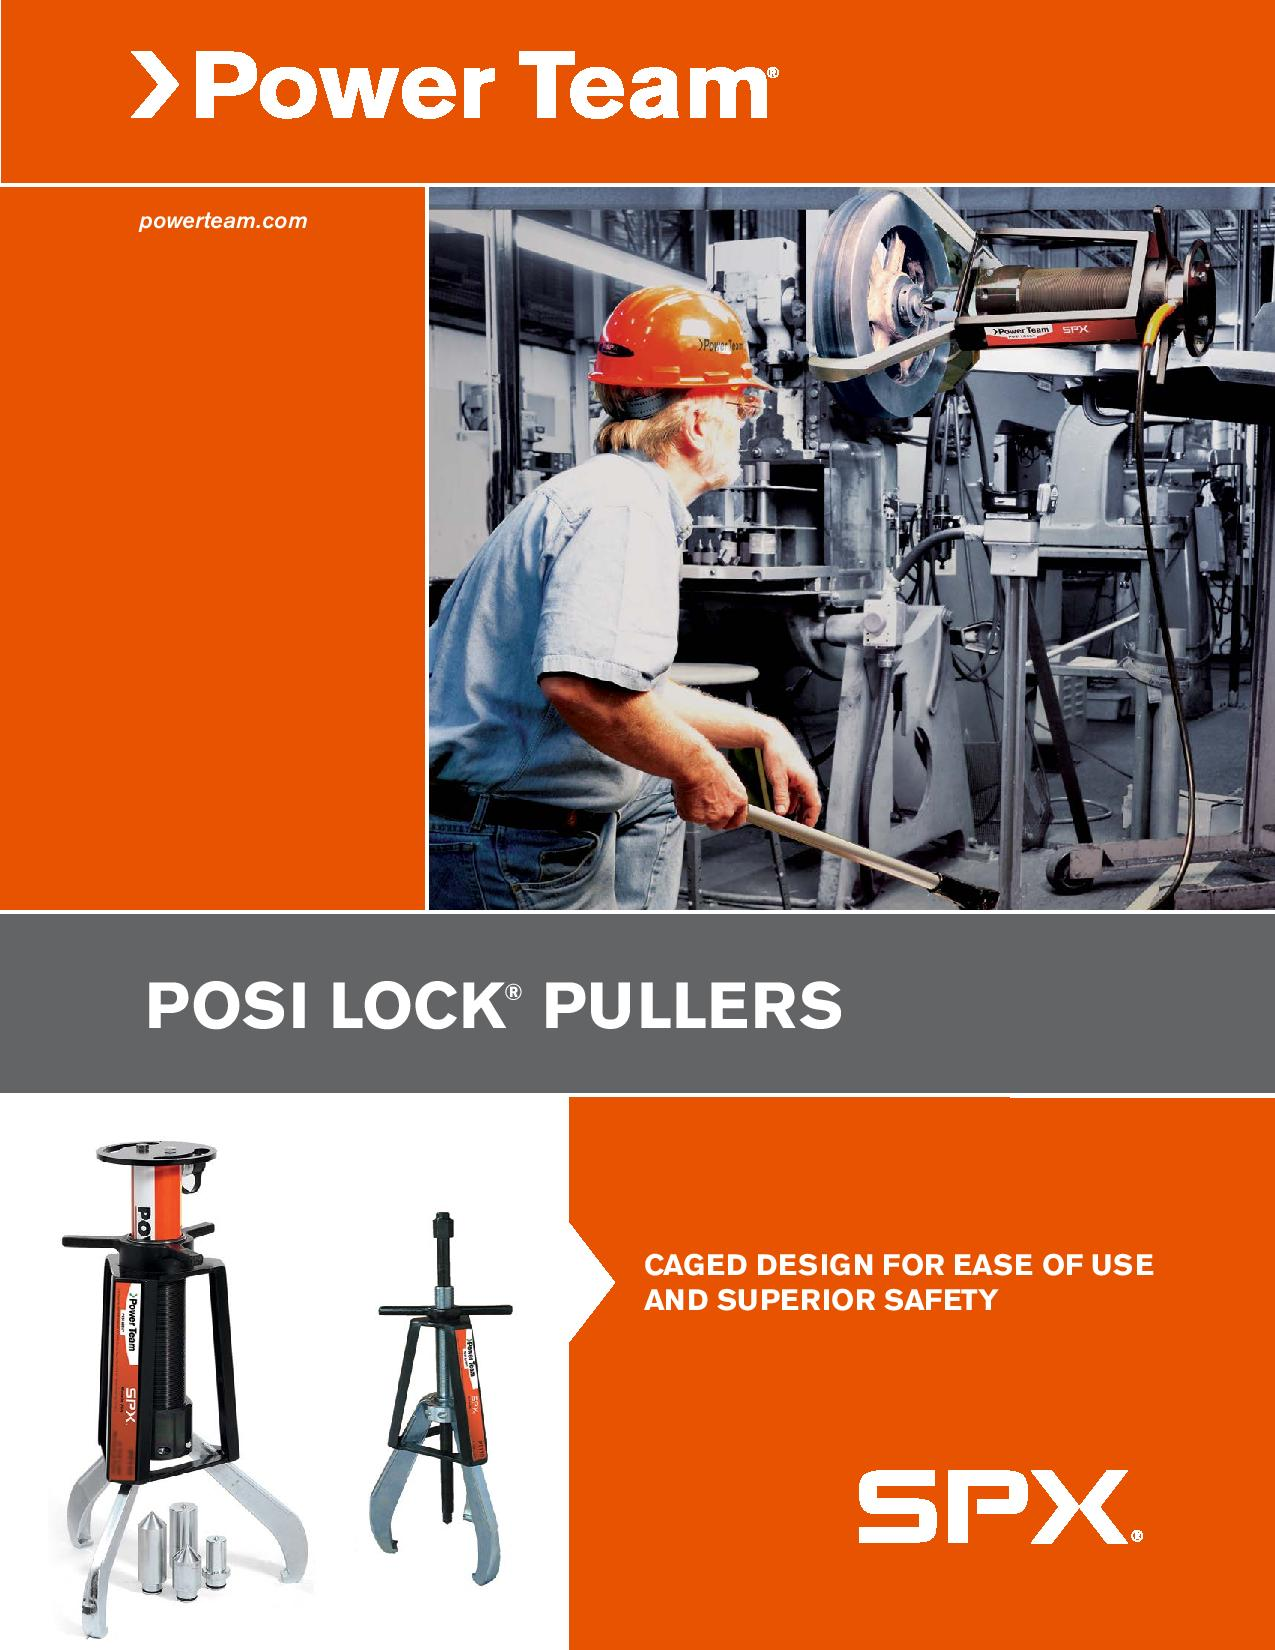 Spx power team posilock ptposl1506 en page 001